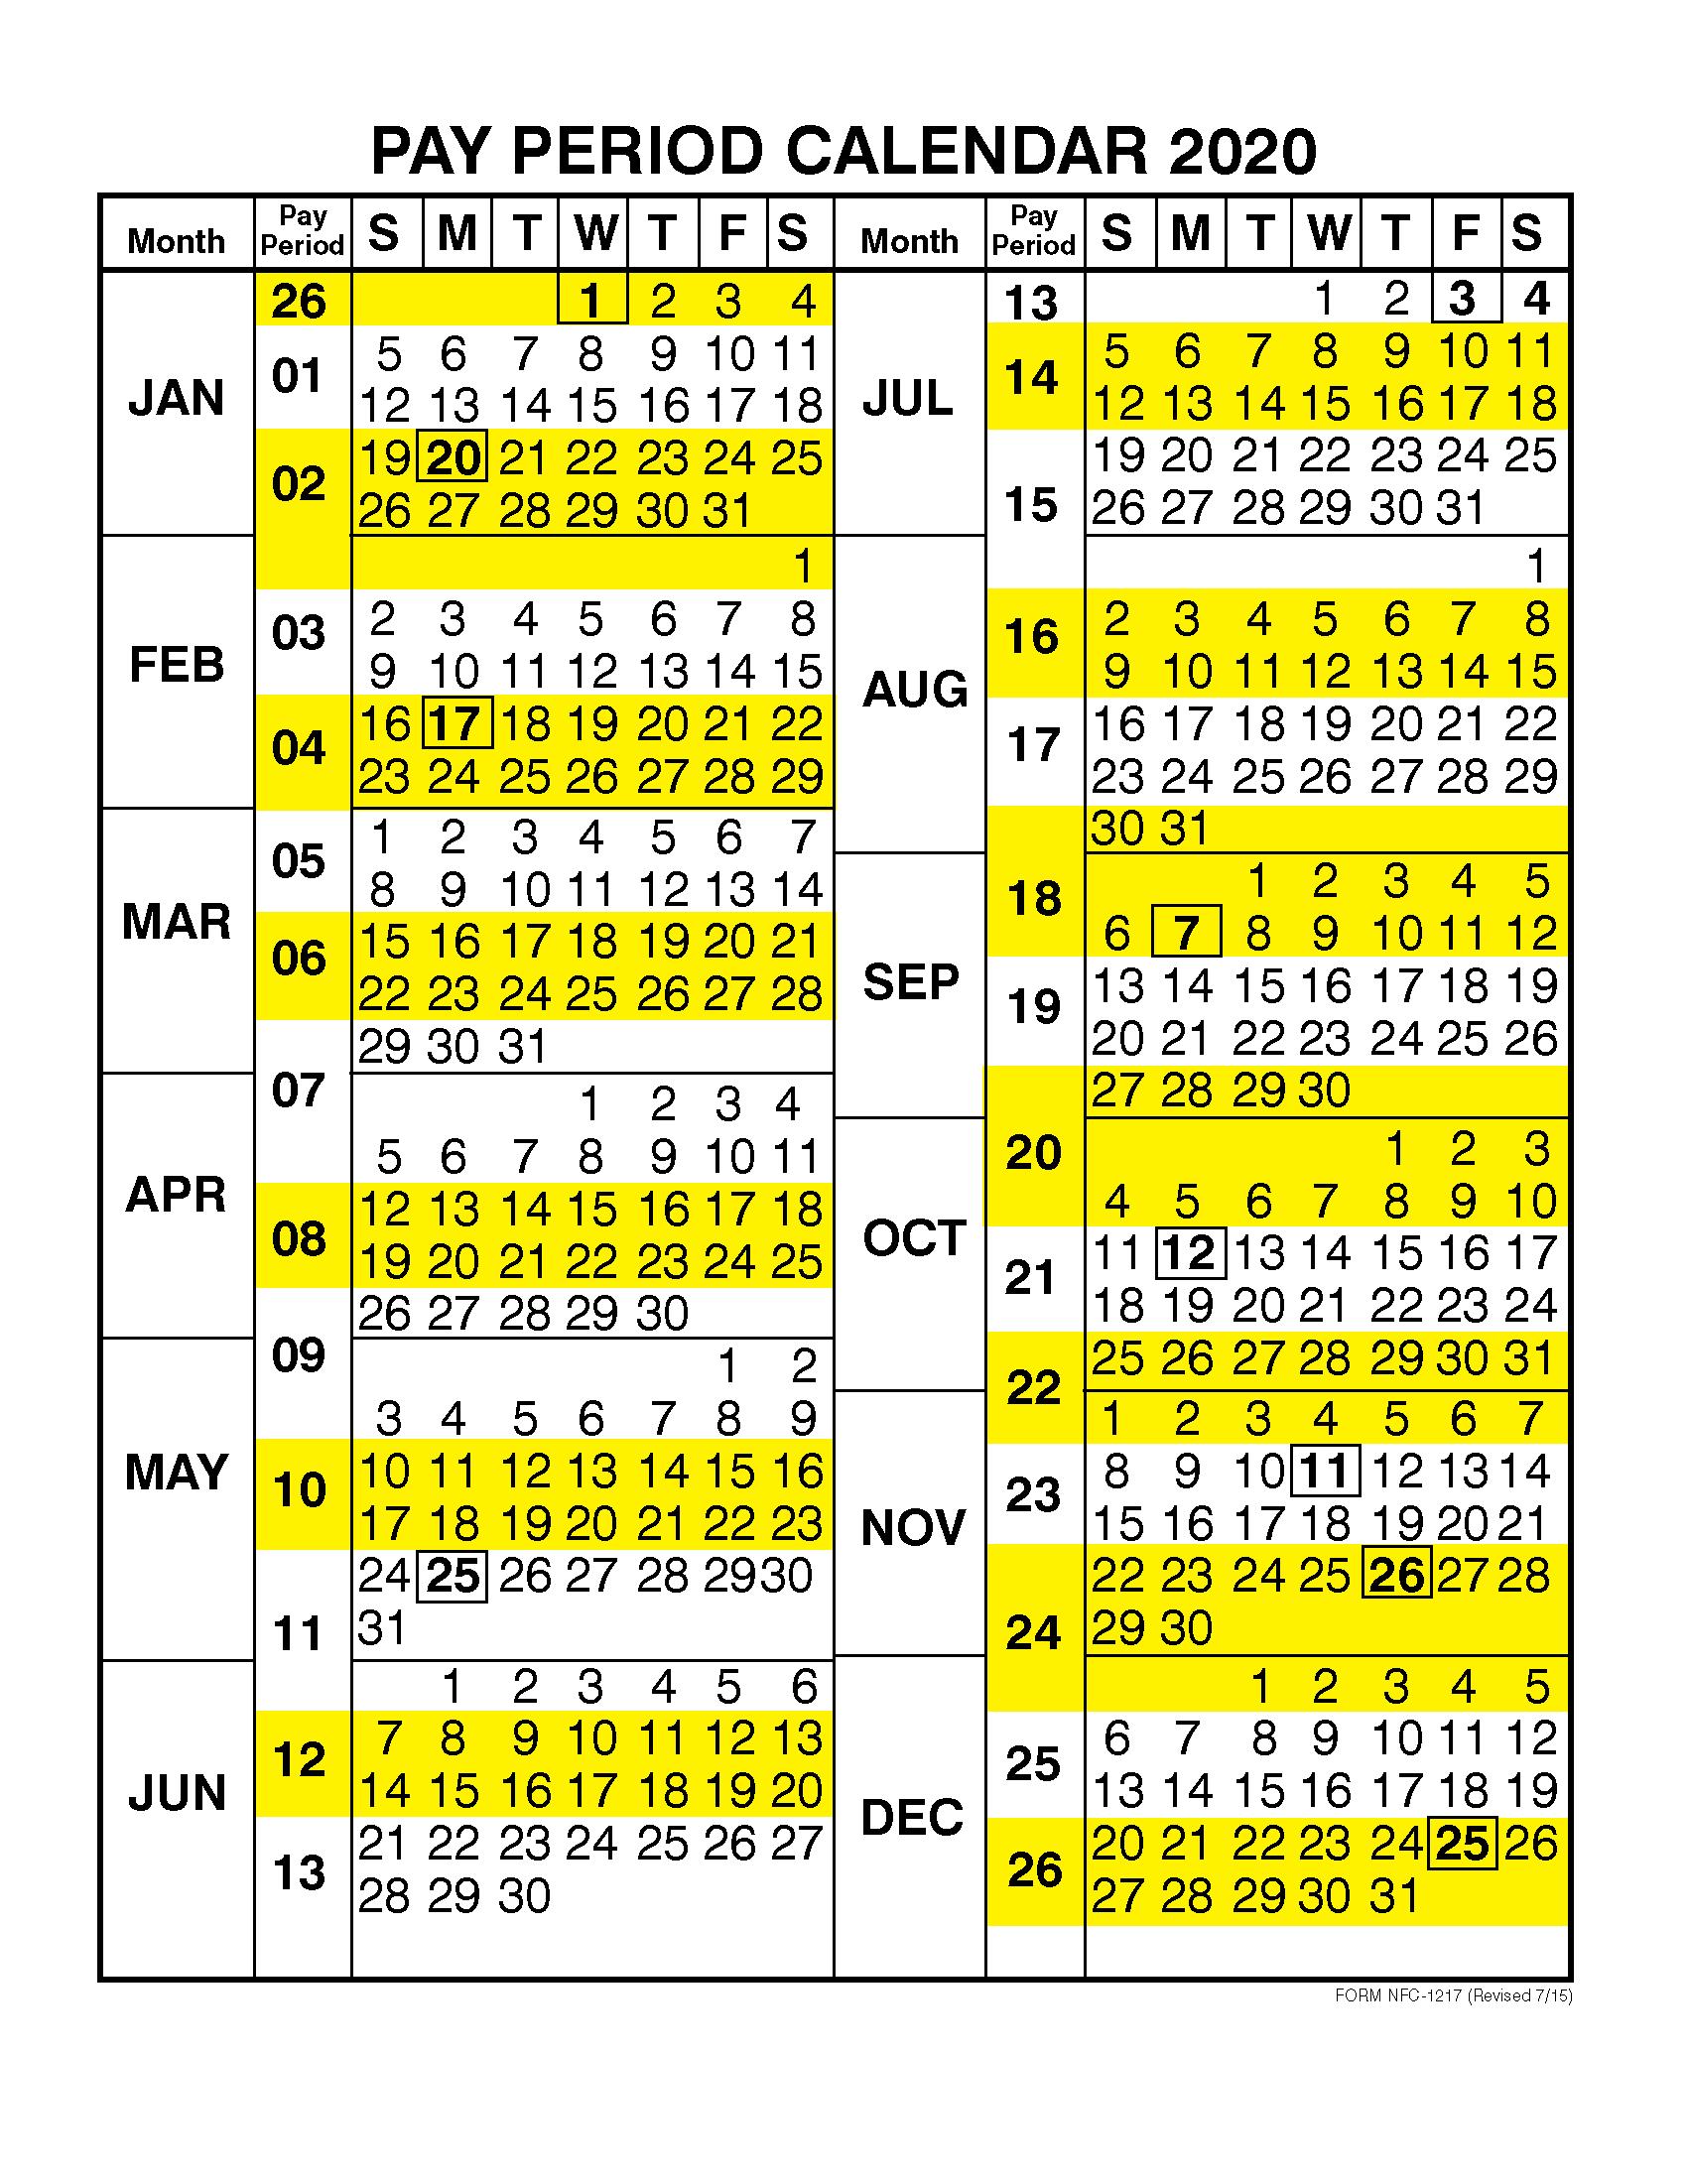 Csun Payroll Calendar 2021 | 2021 Pay Periods Calendar